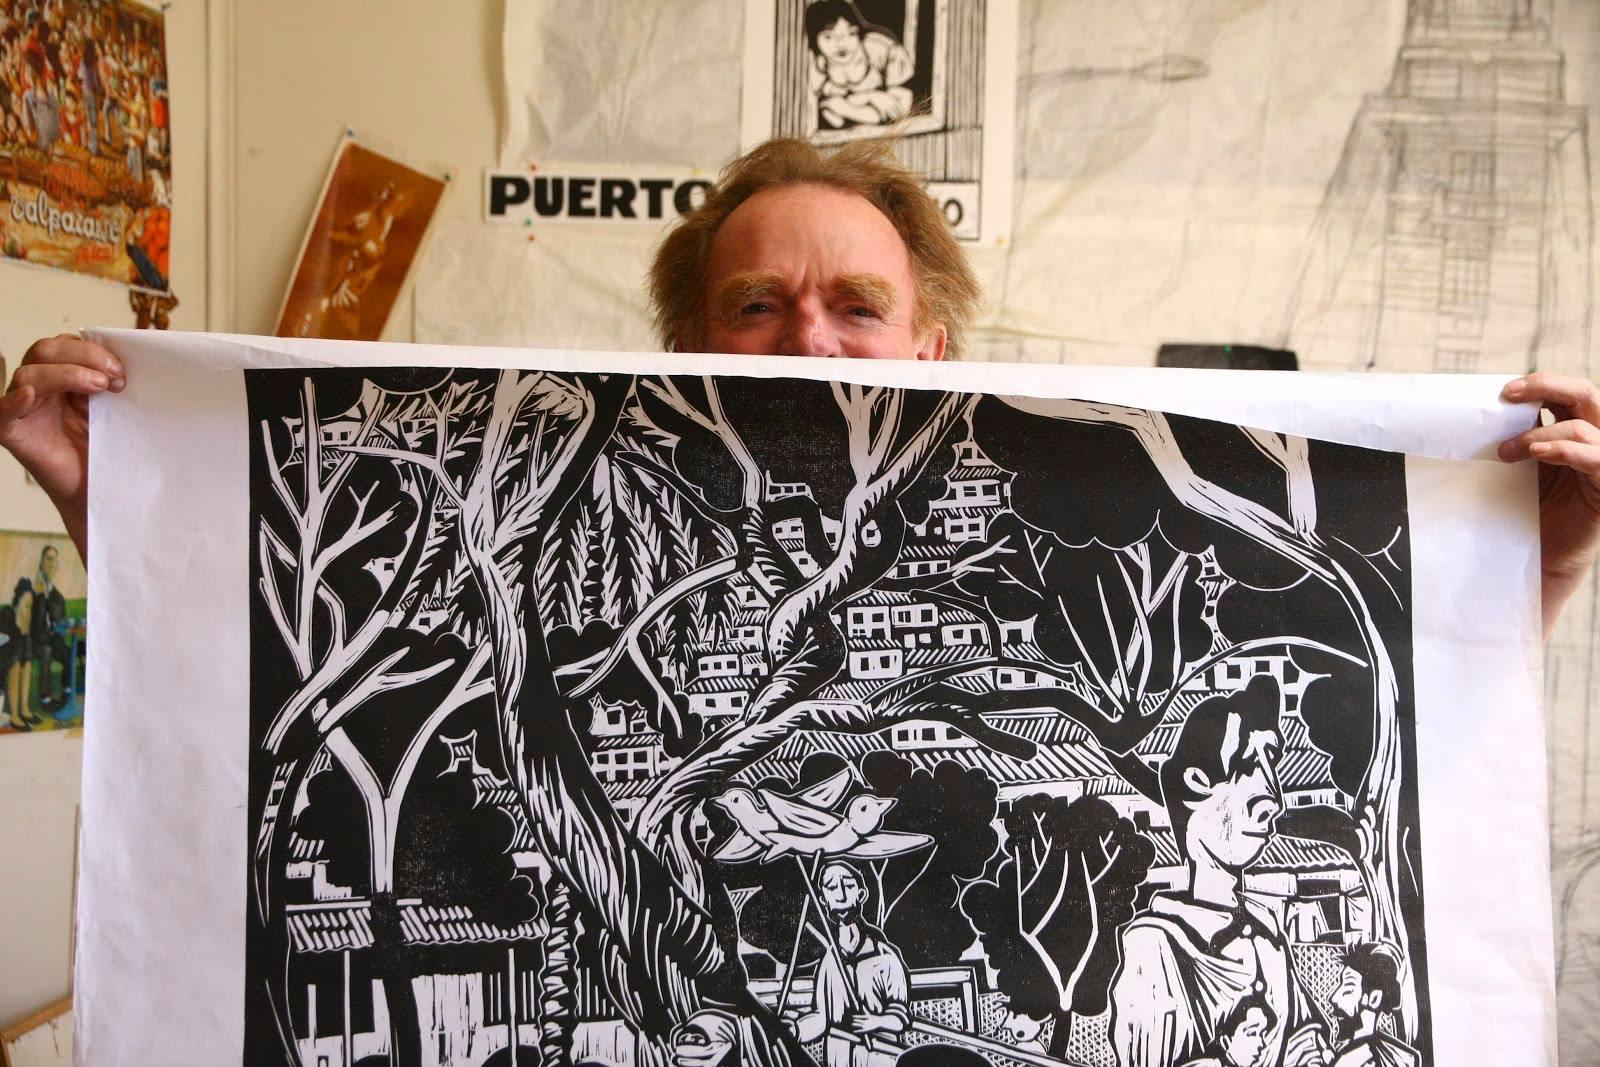 Serigrafía de Loro Coirón